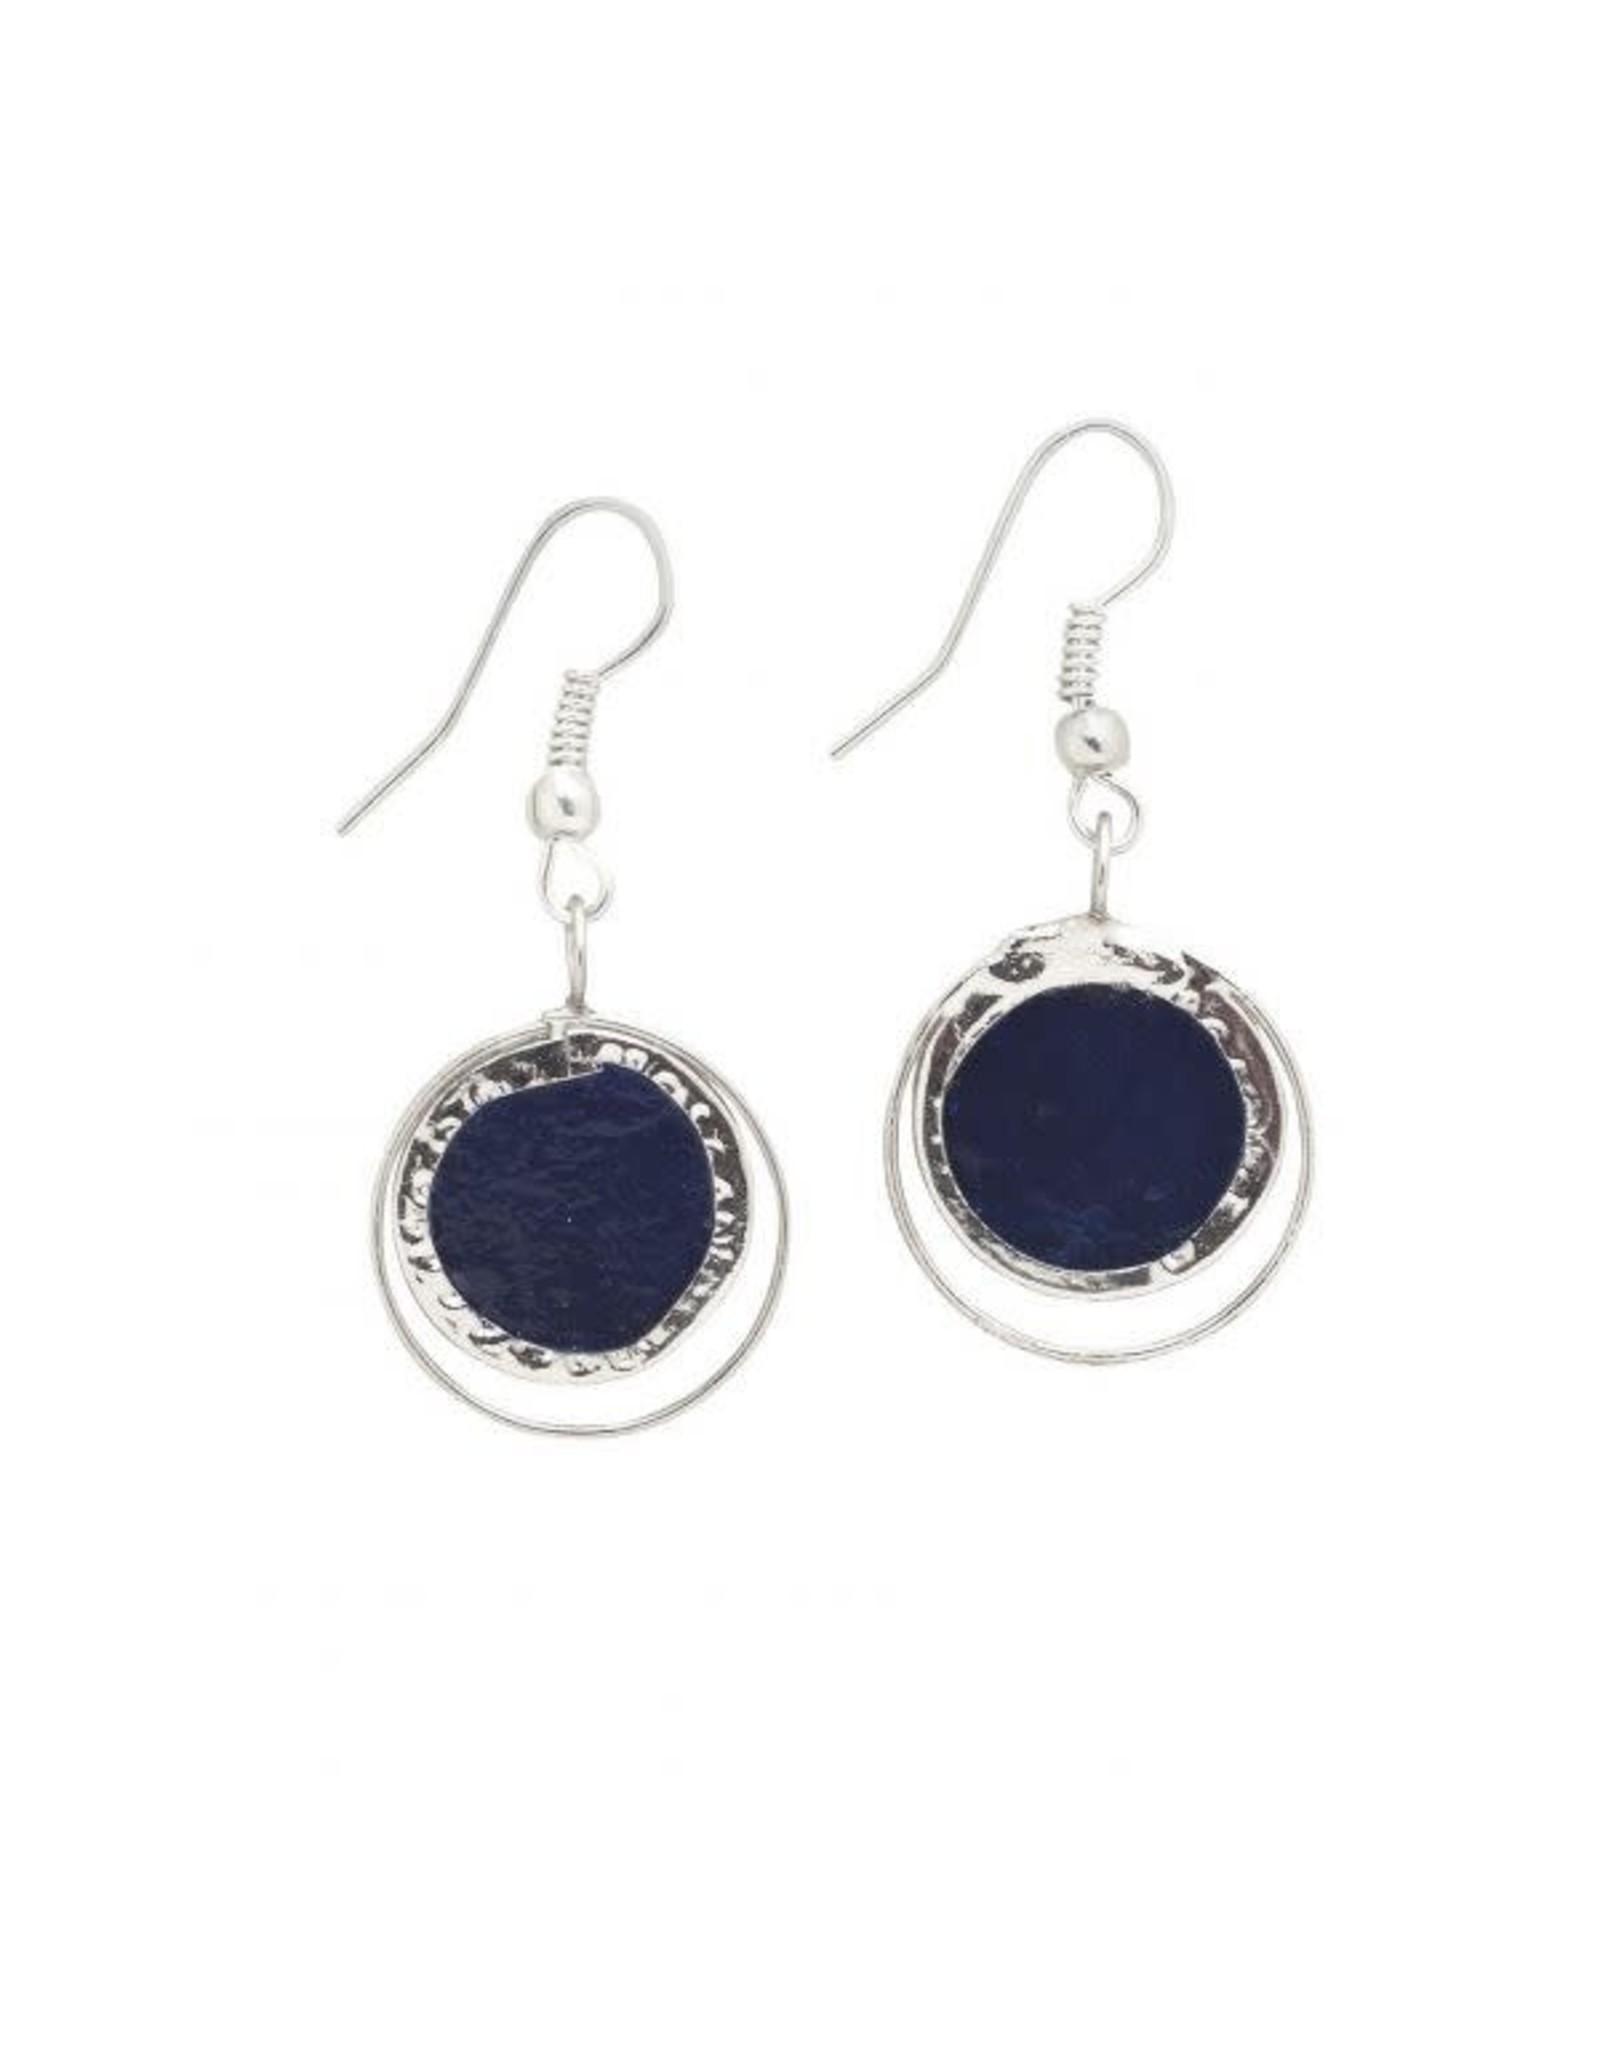 Cobalt Treasure Capiz Earrings, Philippines